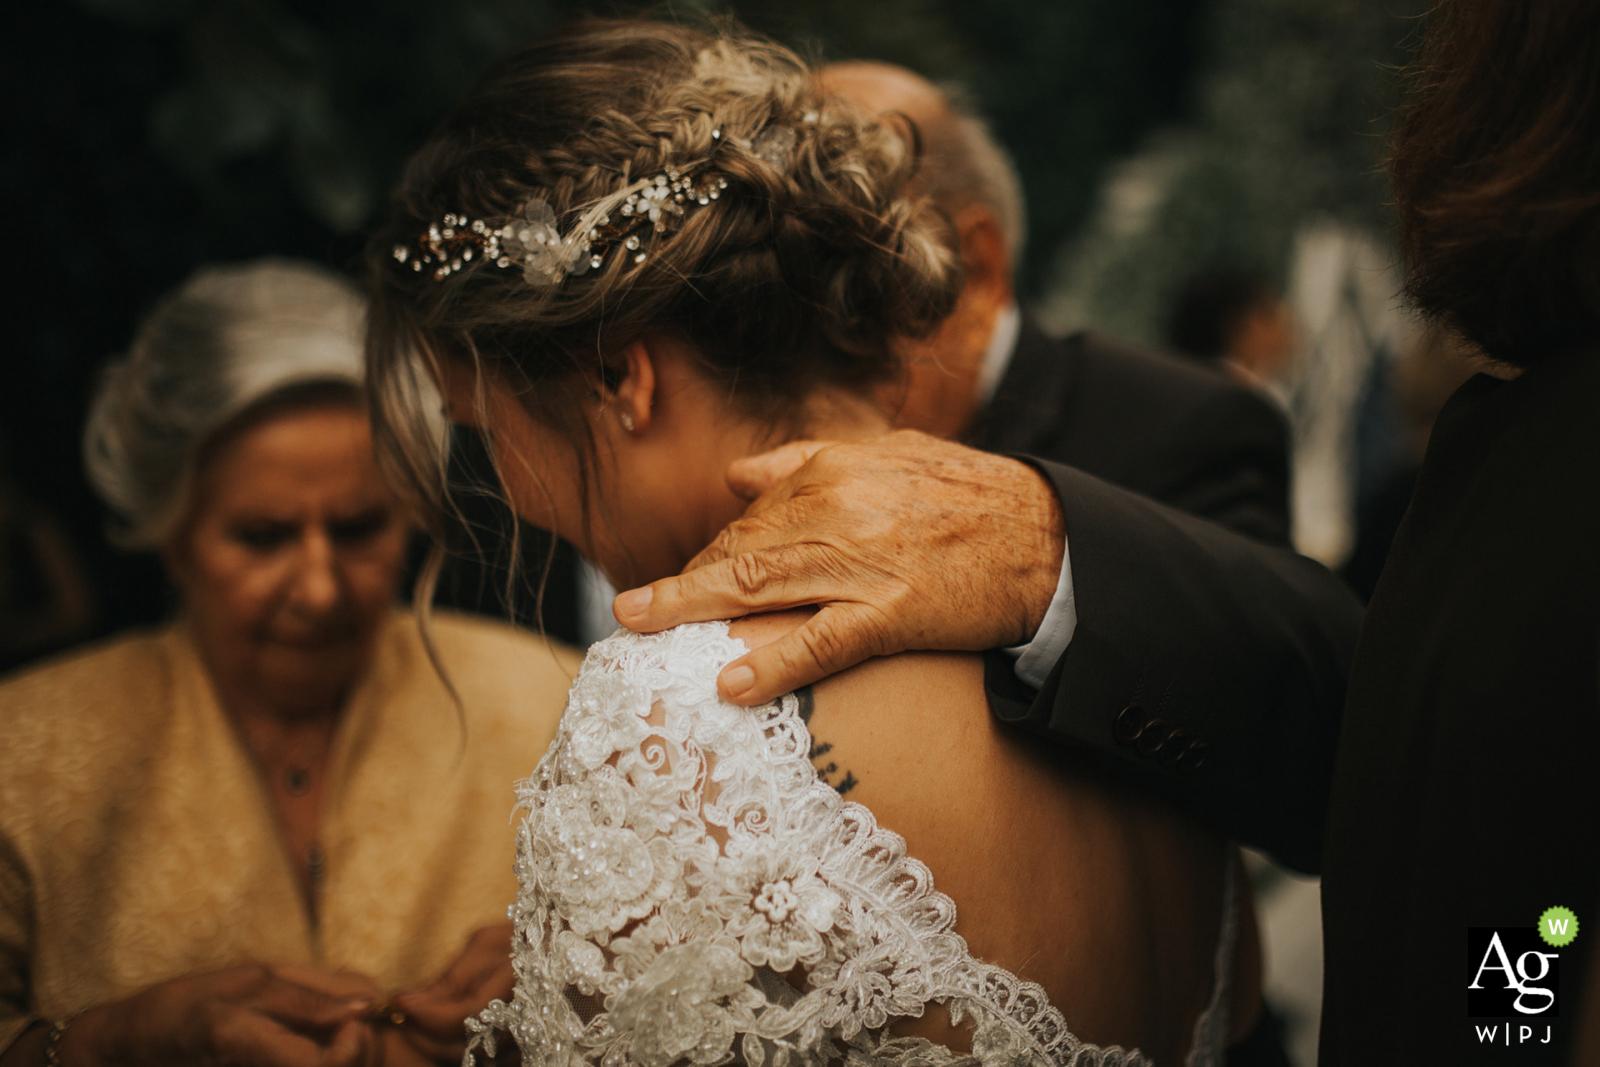 ceremony location: kuzguncuk yanık mektep, istanbul - photo of the hand of the bride's grandpa